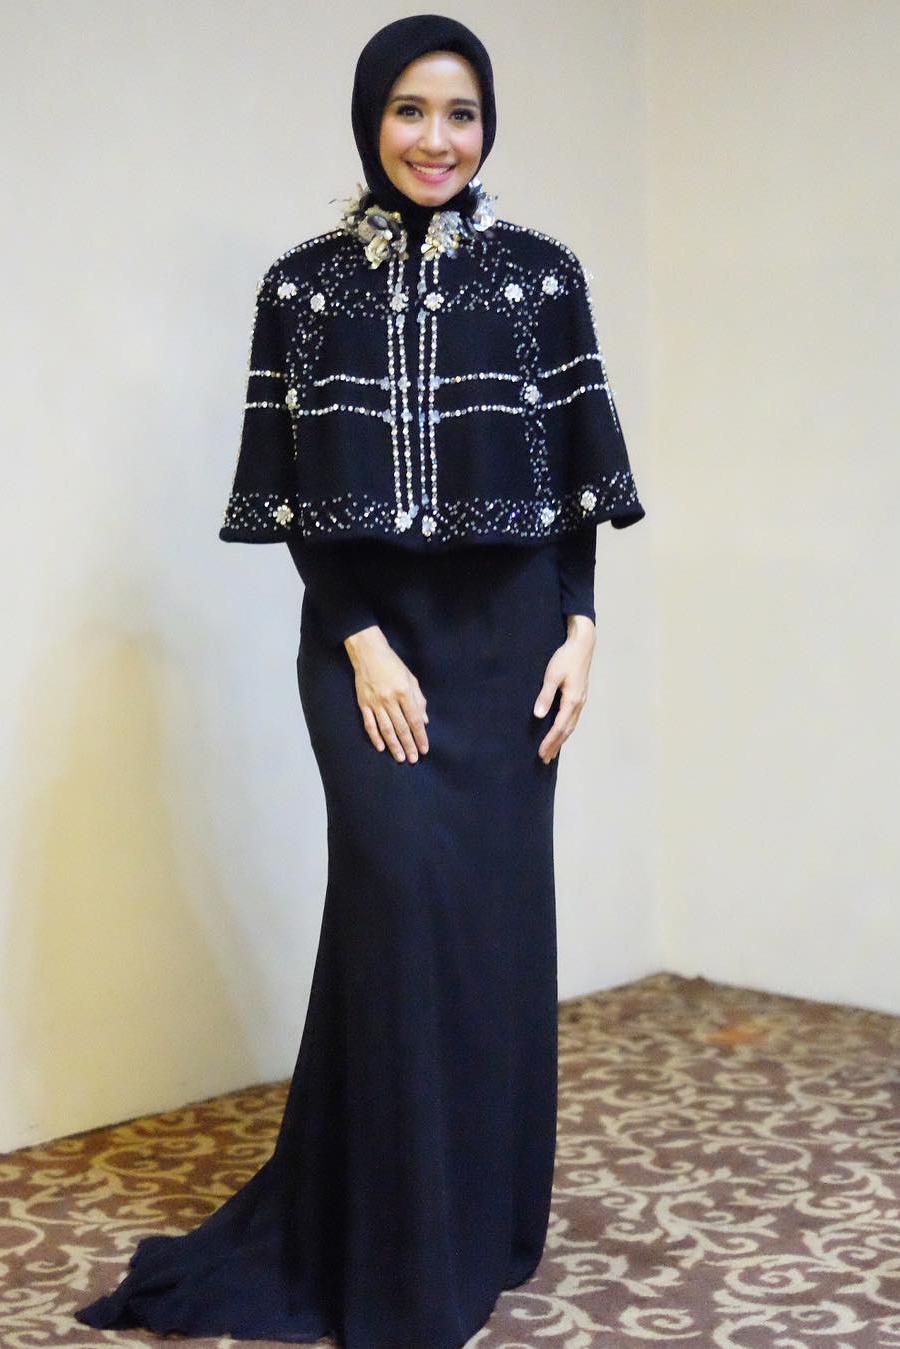 Gaya Hijab Artis Cantik Laudya Cynthia Bella Yang Simple Tapi Elegan Dzargon